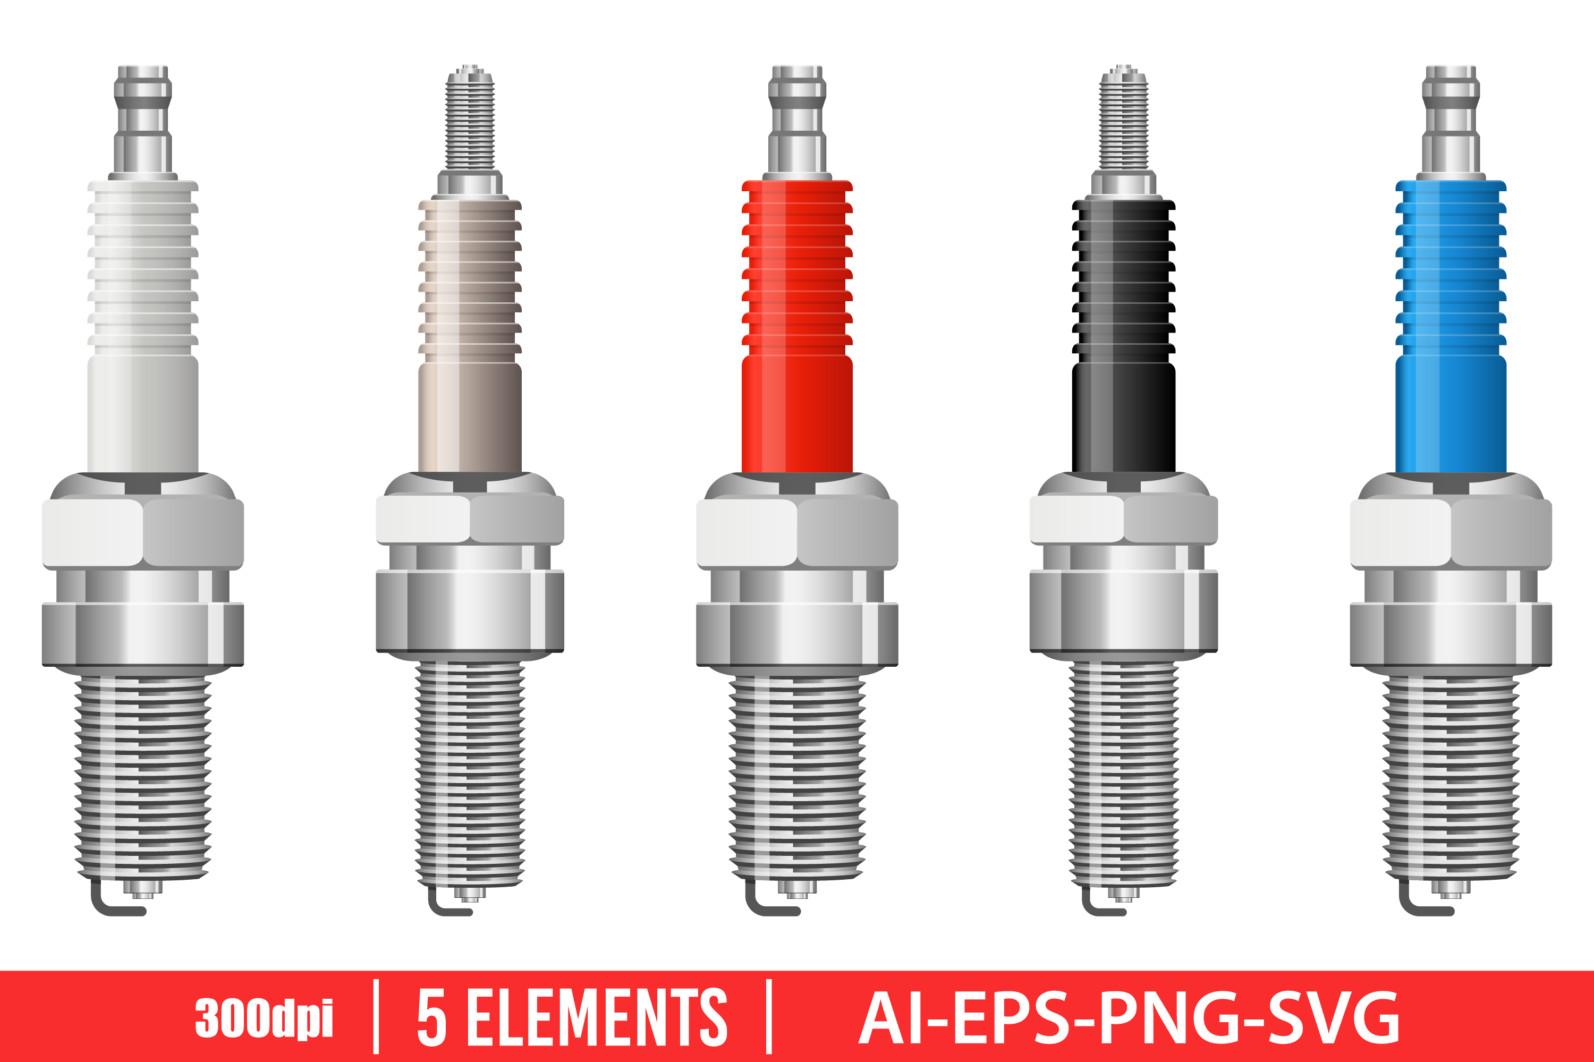 Spark plug clipart vector design illustration. Plug set. Vector Clipart Print - ENGINE PLUG scaled -